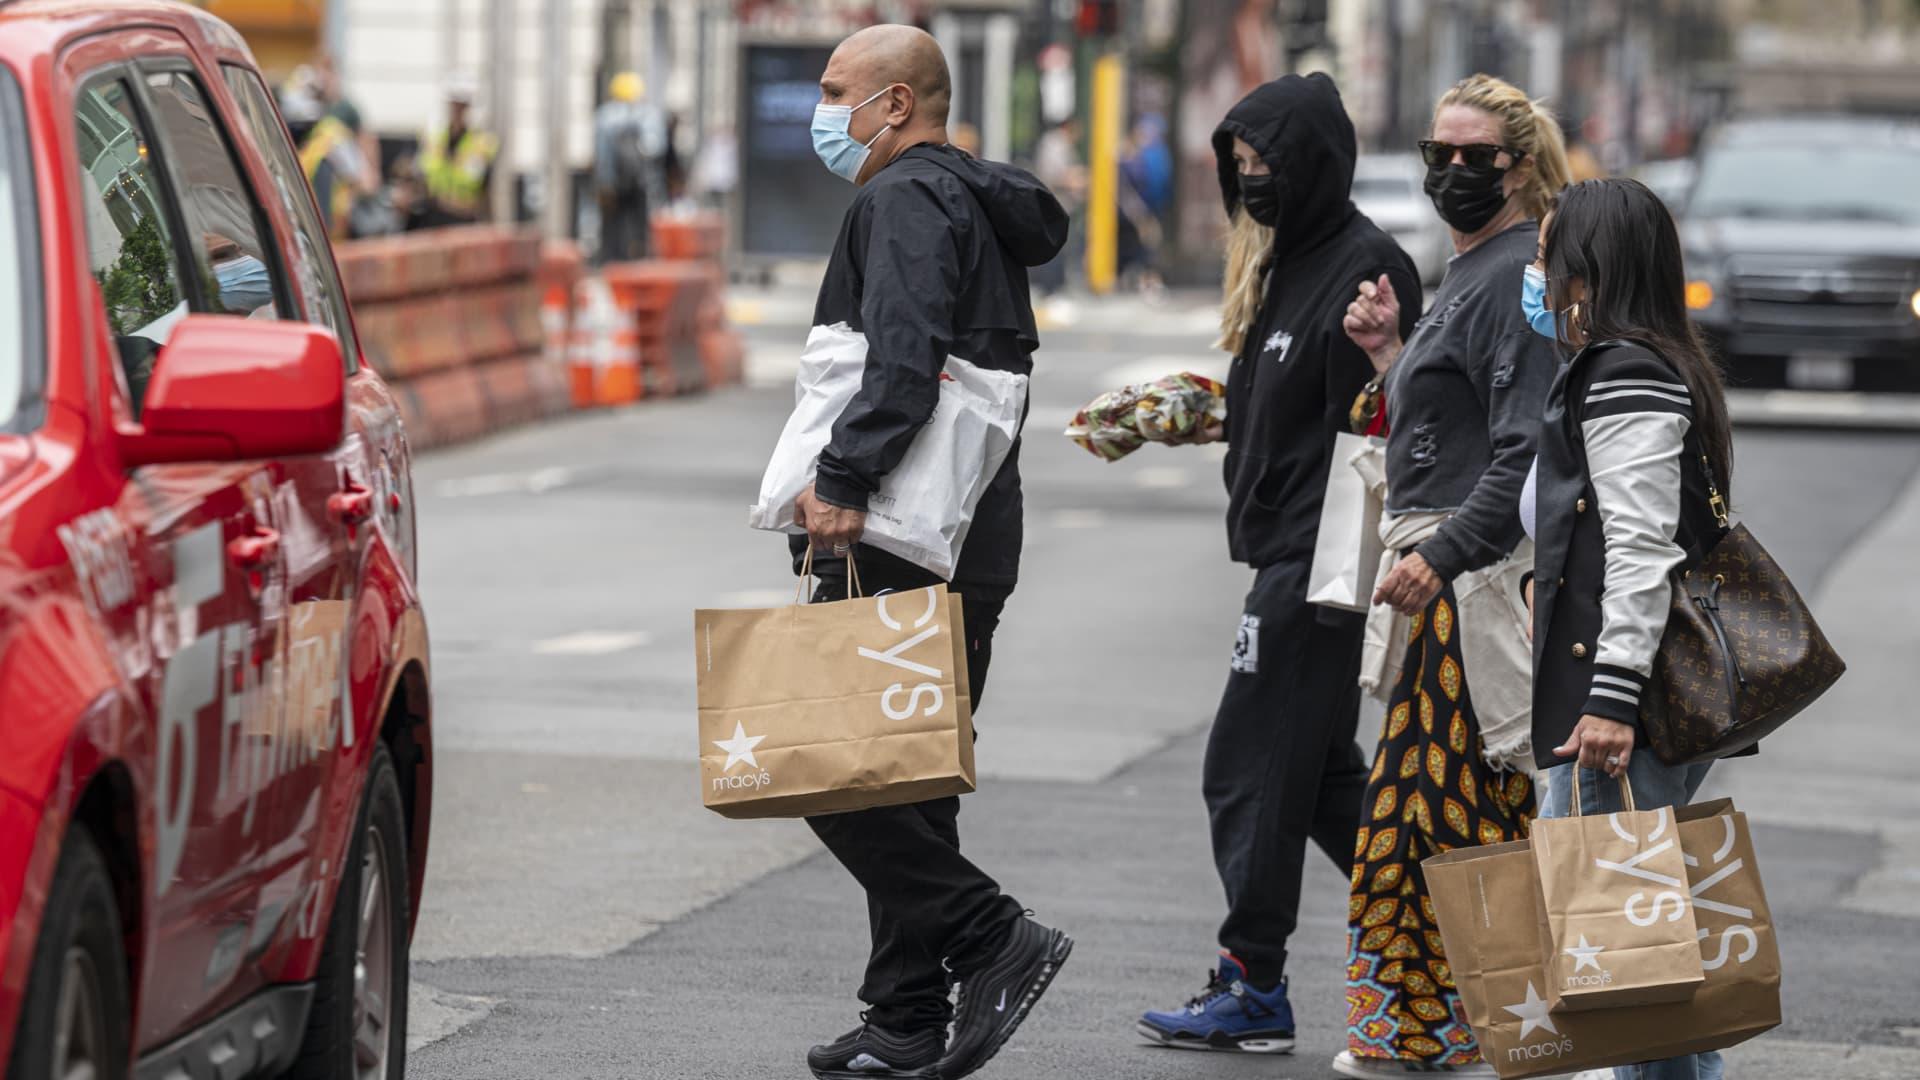 Pedestrians carry Macy's shopping bags in San Francisco, California, U.S., on Thursday, Sept. 16, 2021.